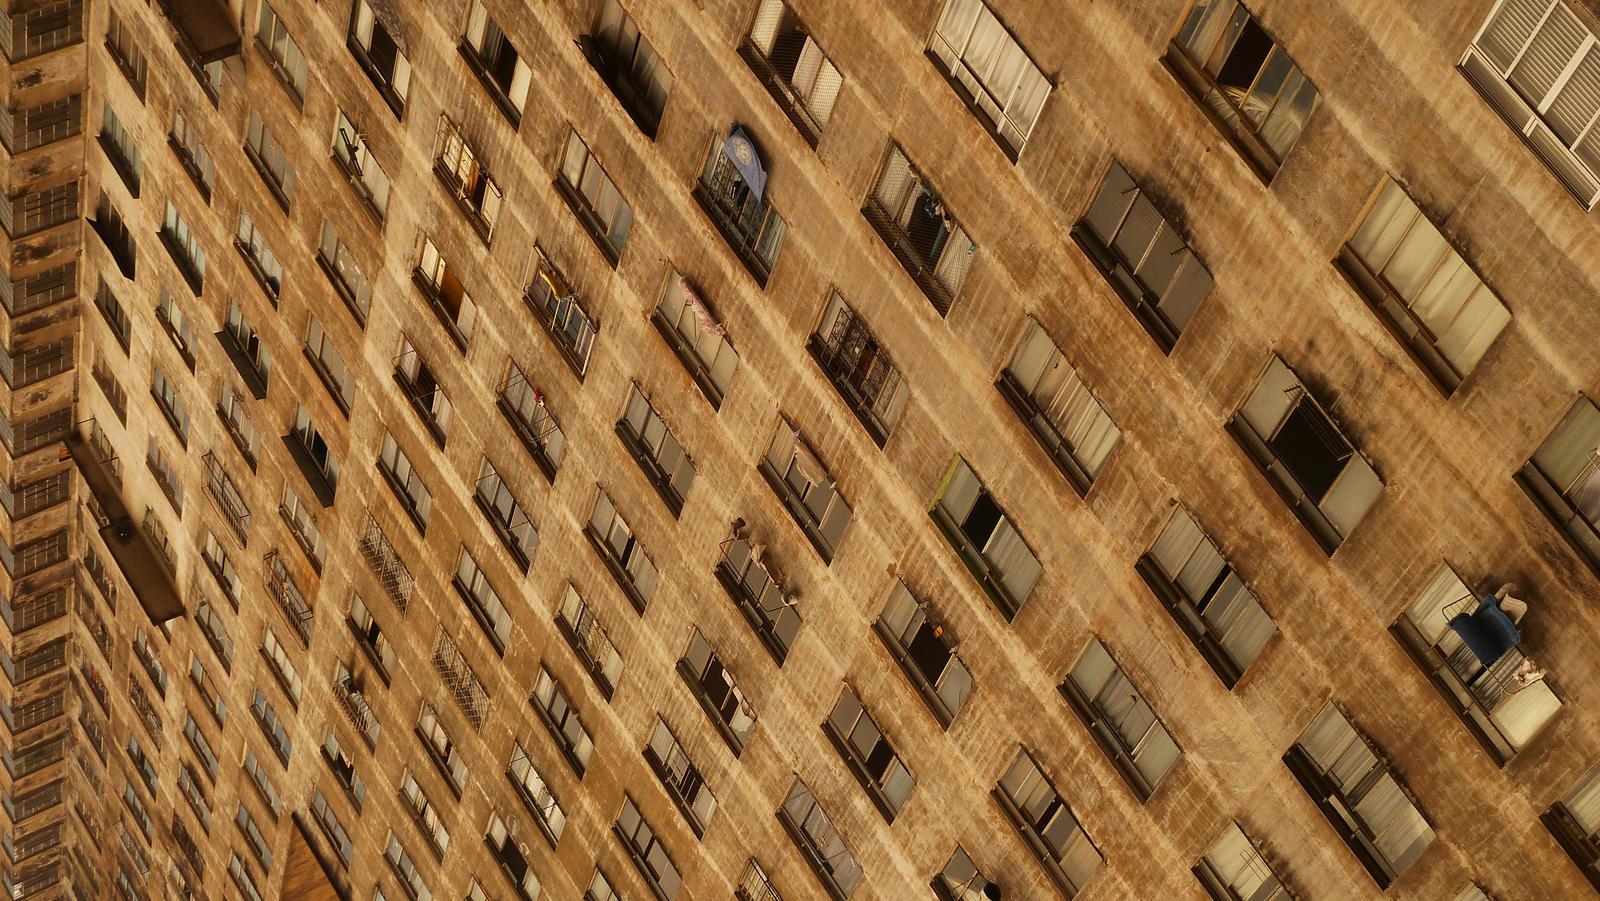 Building 2 / Belo- horizonte / Brasil by WillemFred